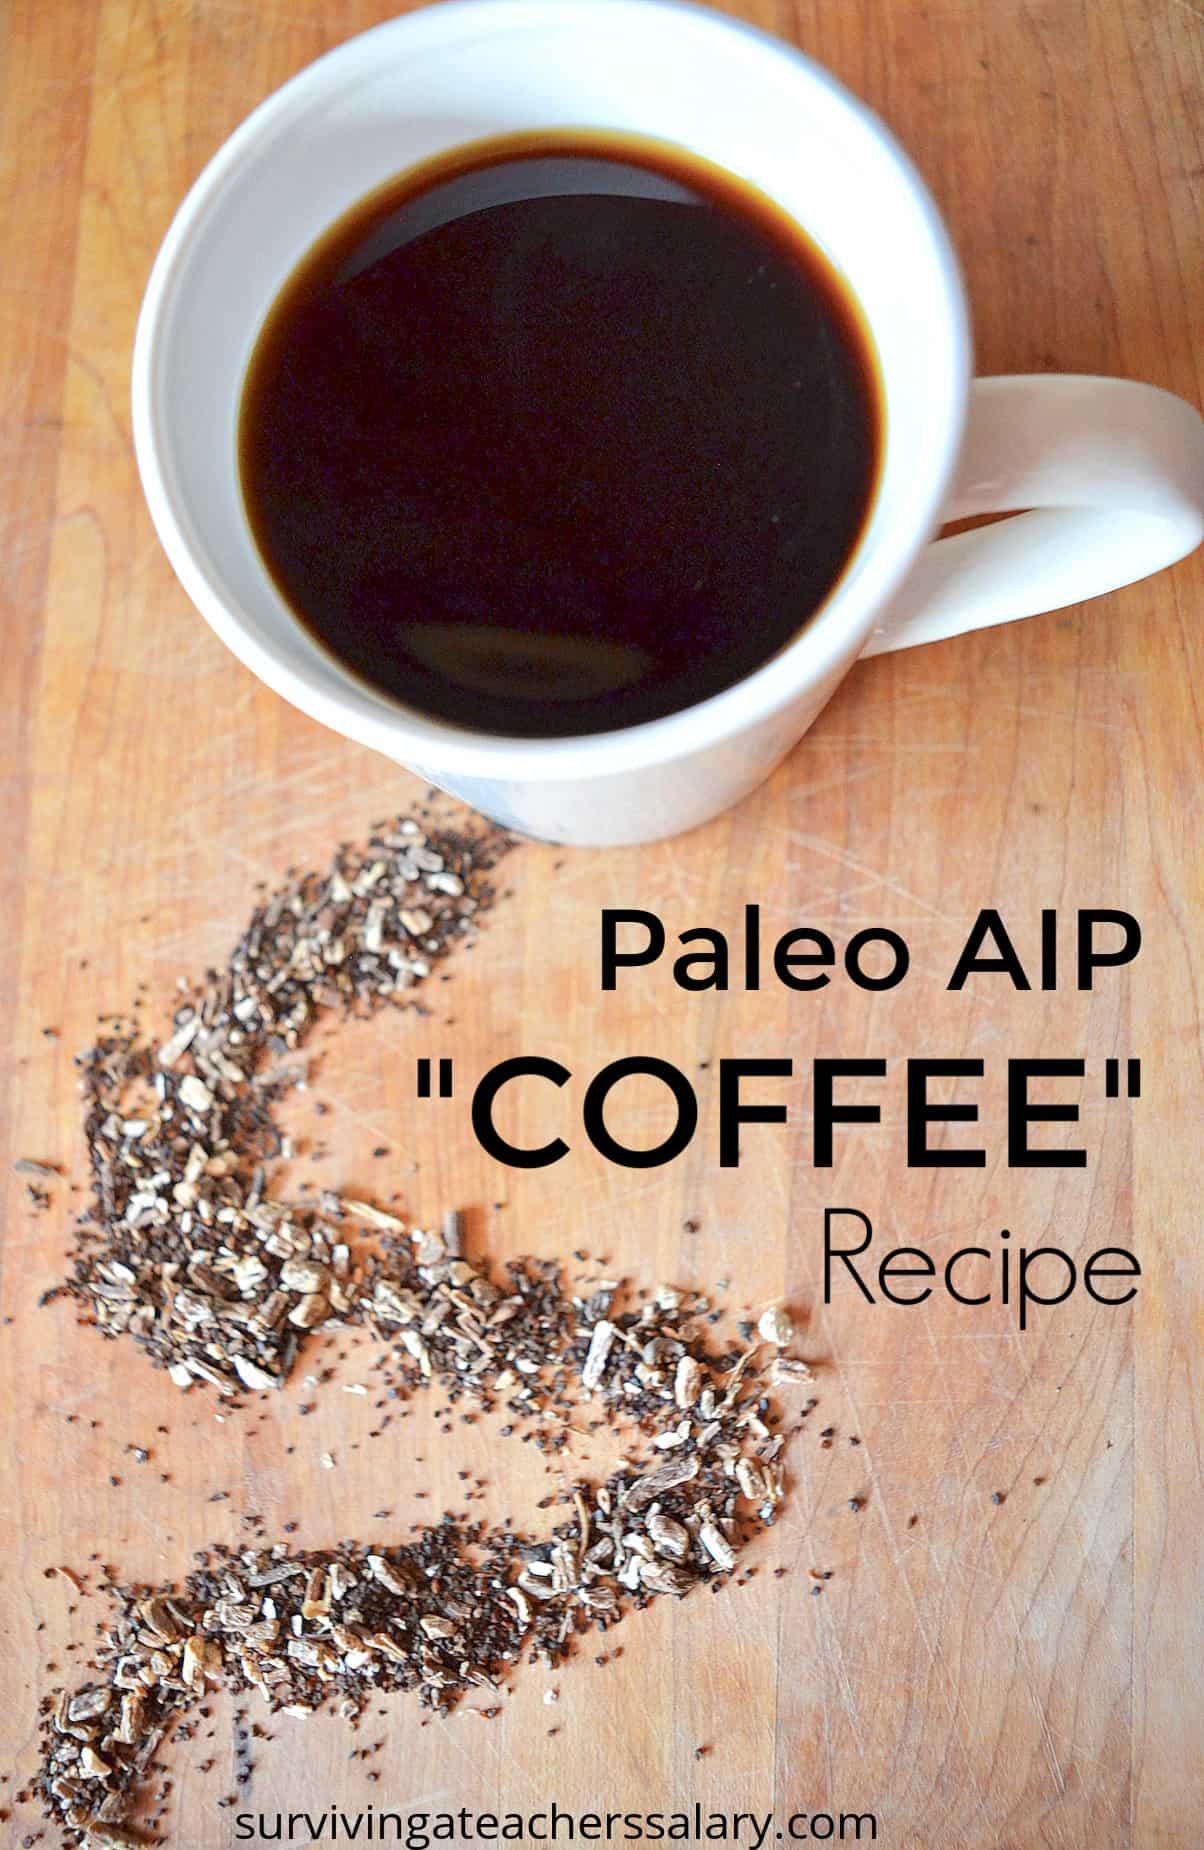 Paleo AIP Coffee in white mug with chicory dandelion root